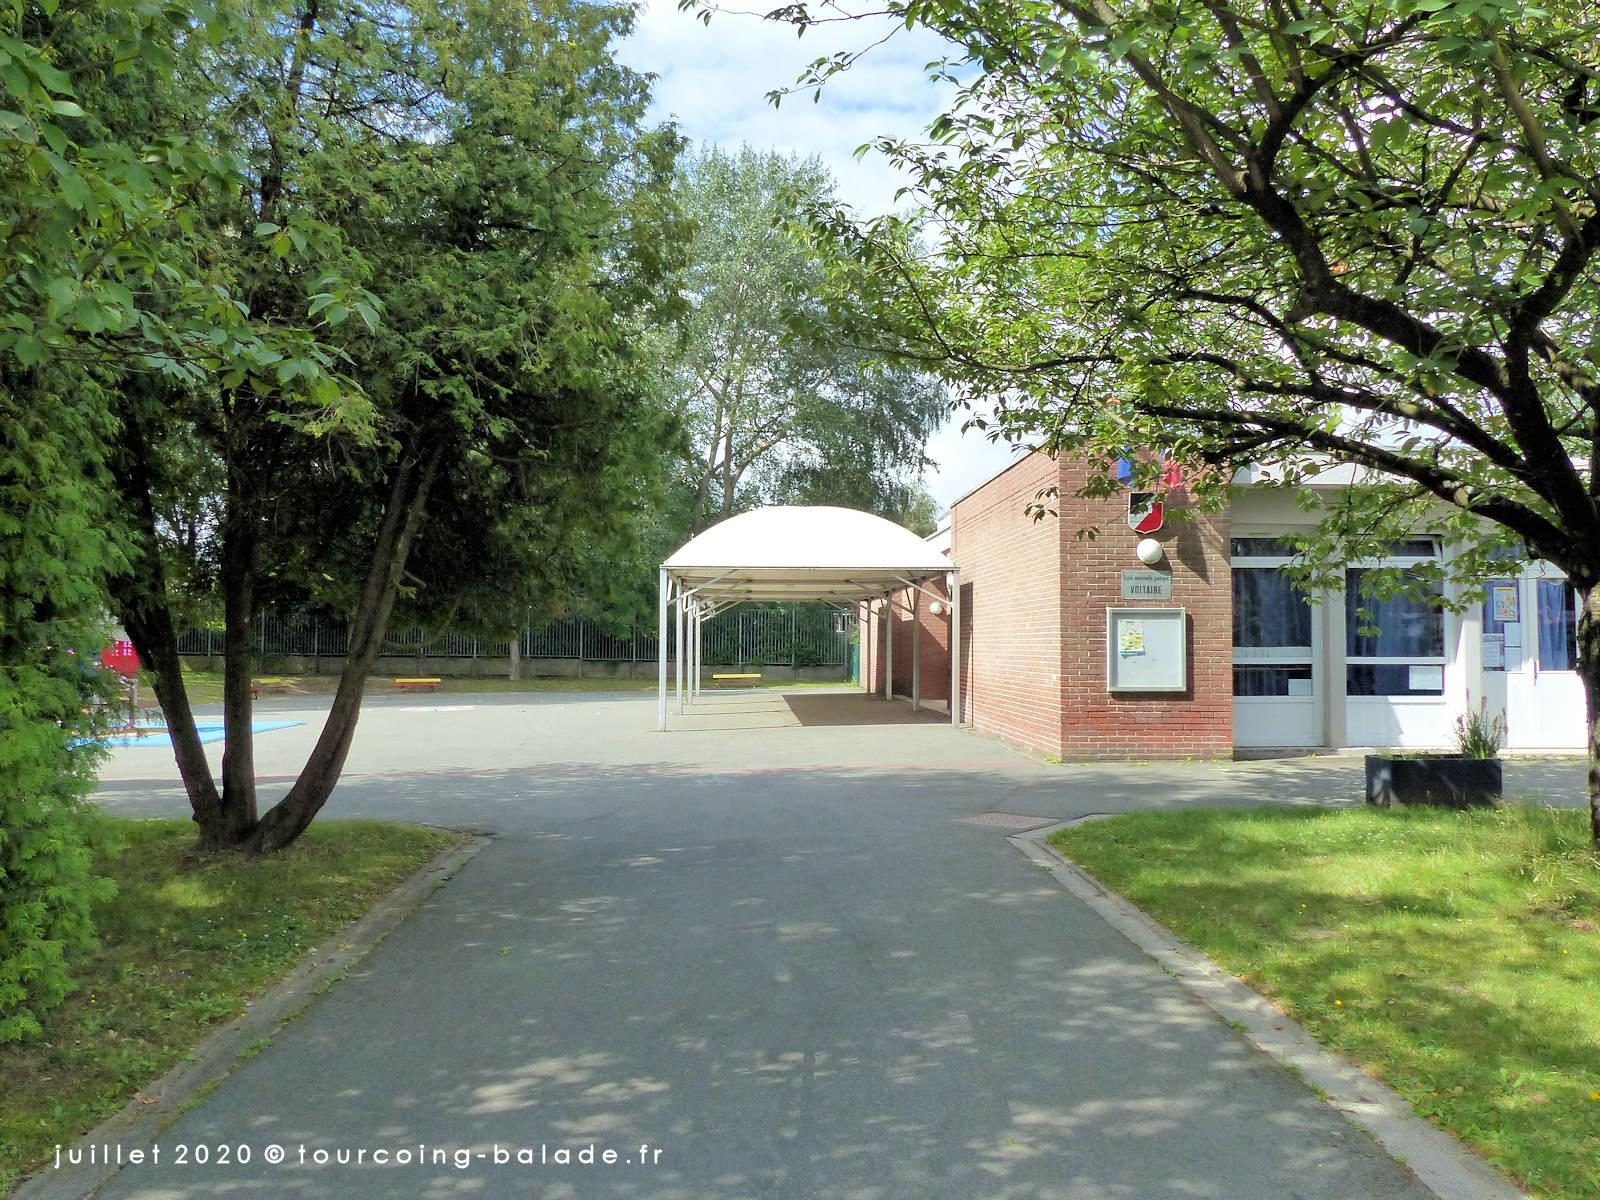 École Maternelle Voltaire, Tourcoing 2020